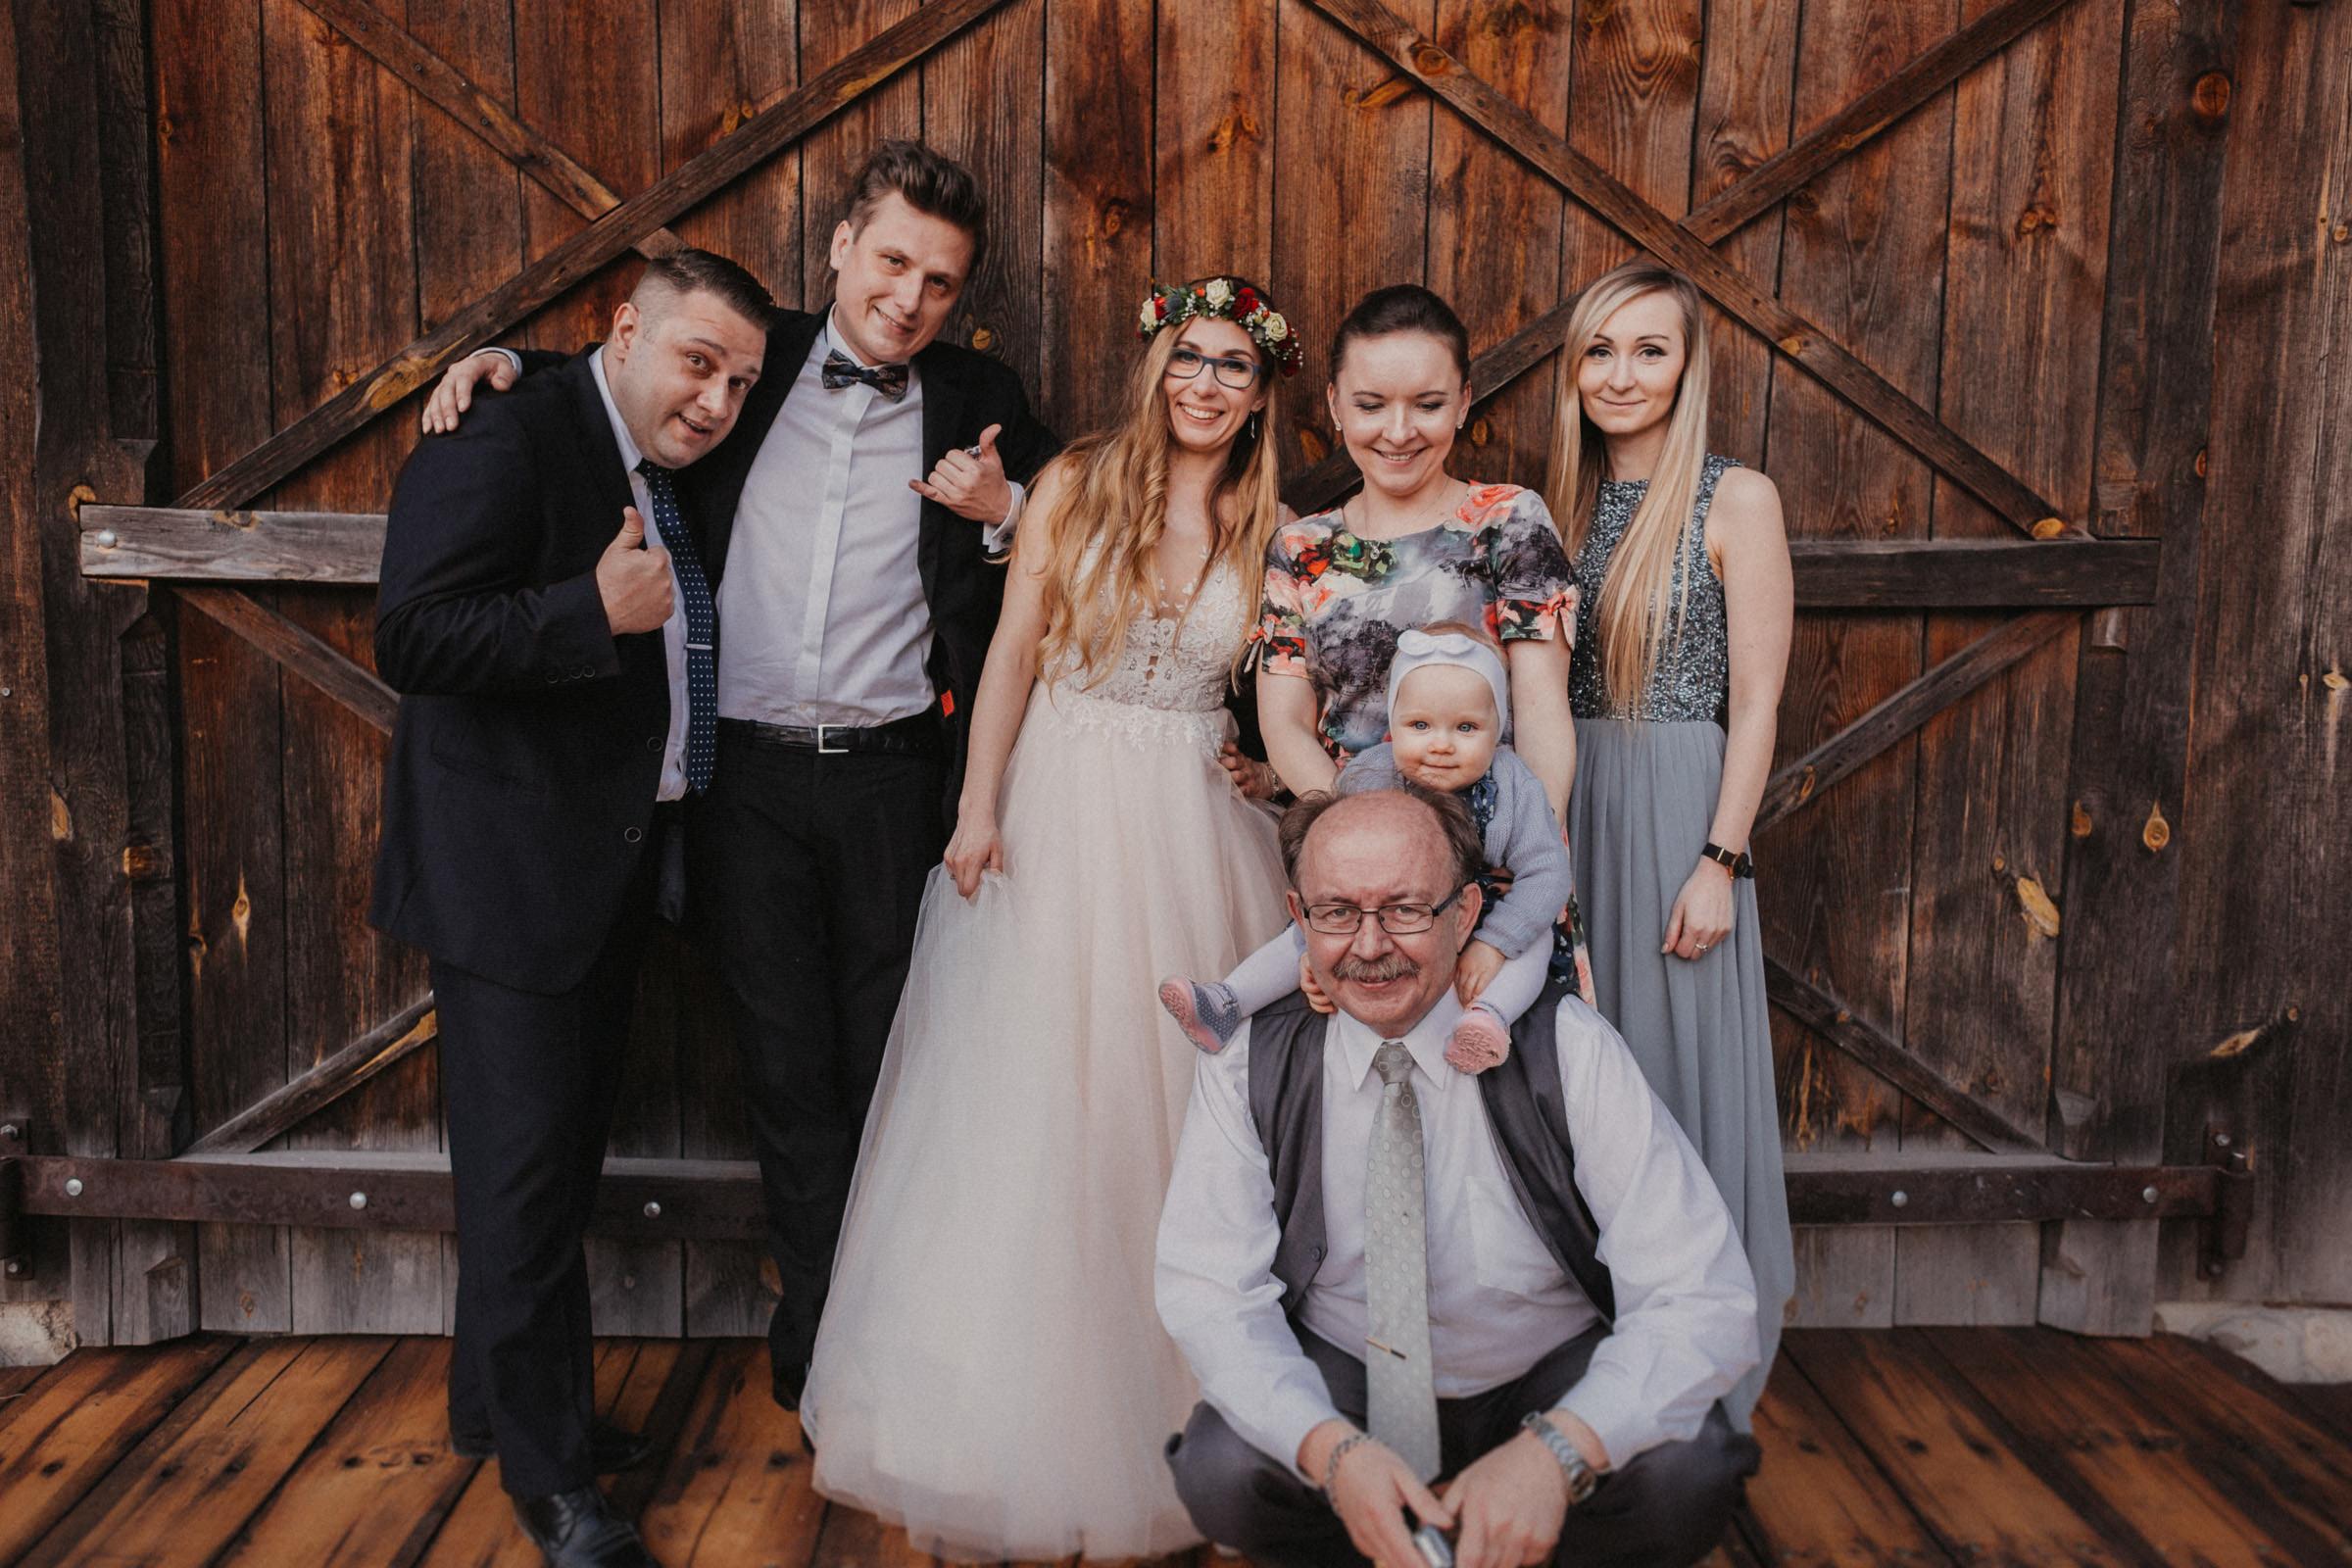 fotograf na ślub siedlce